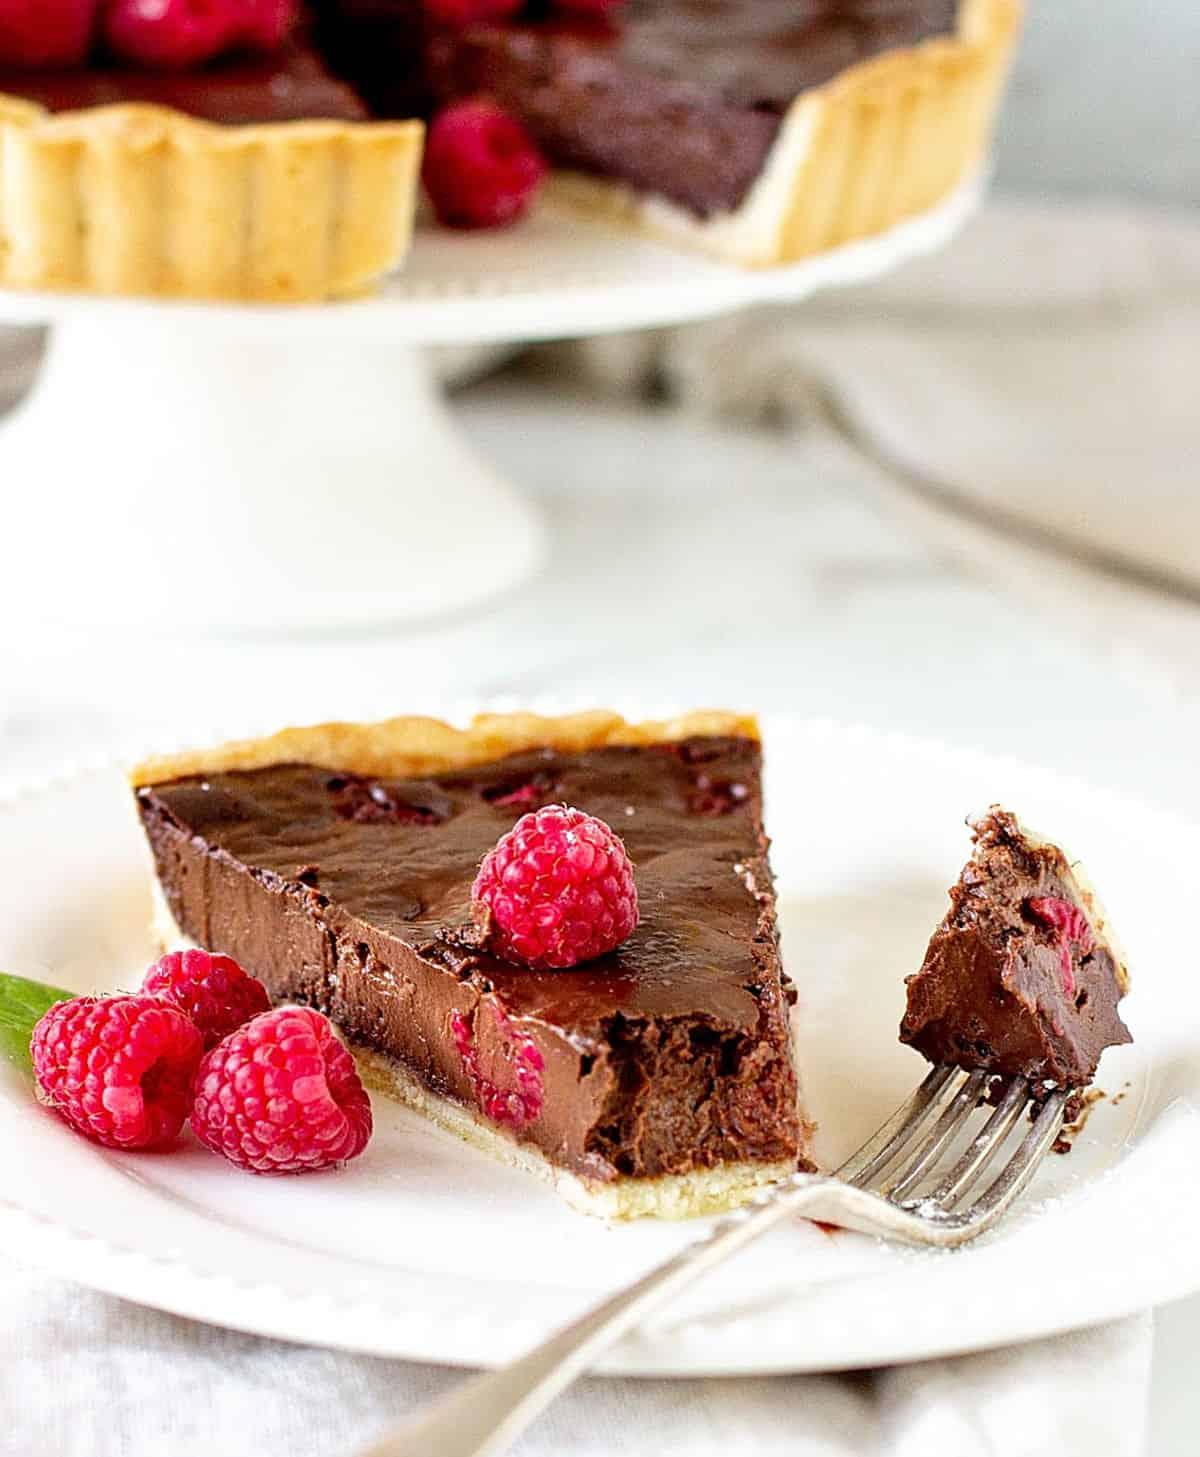 Slice of chocolate raspberry tart, on white plate, silver fork, tart on background